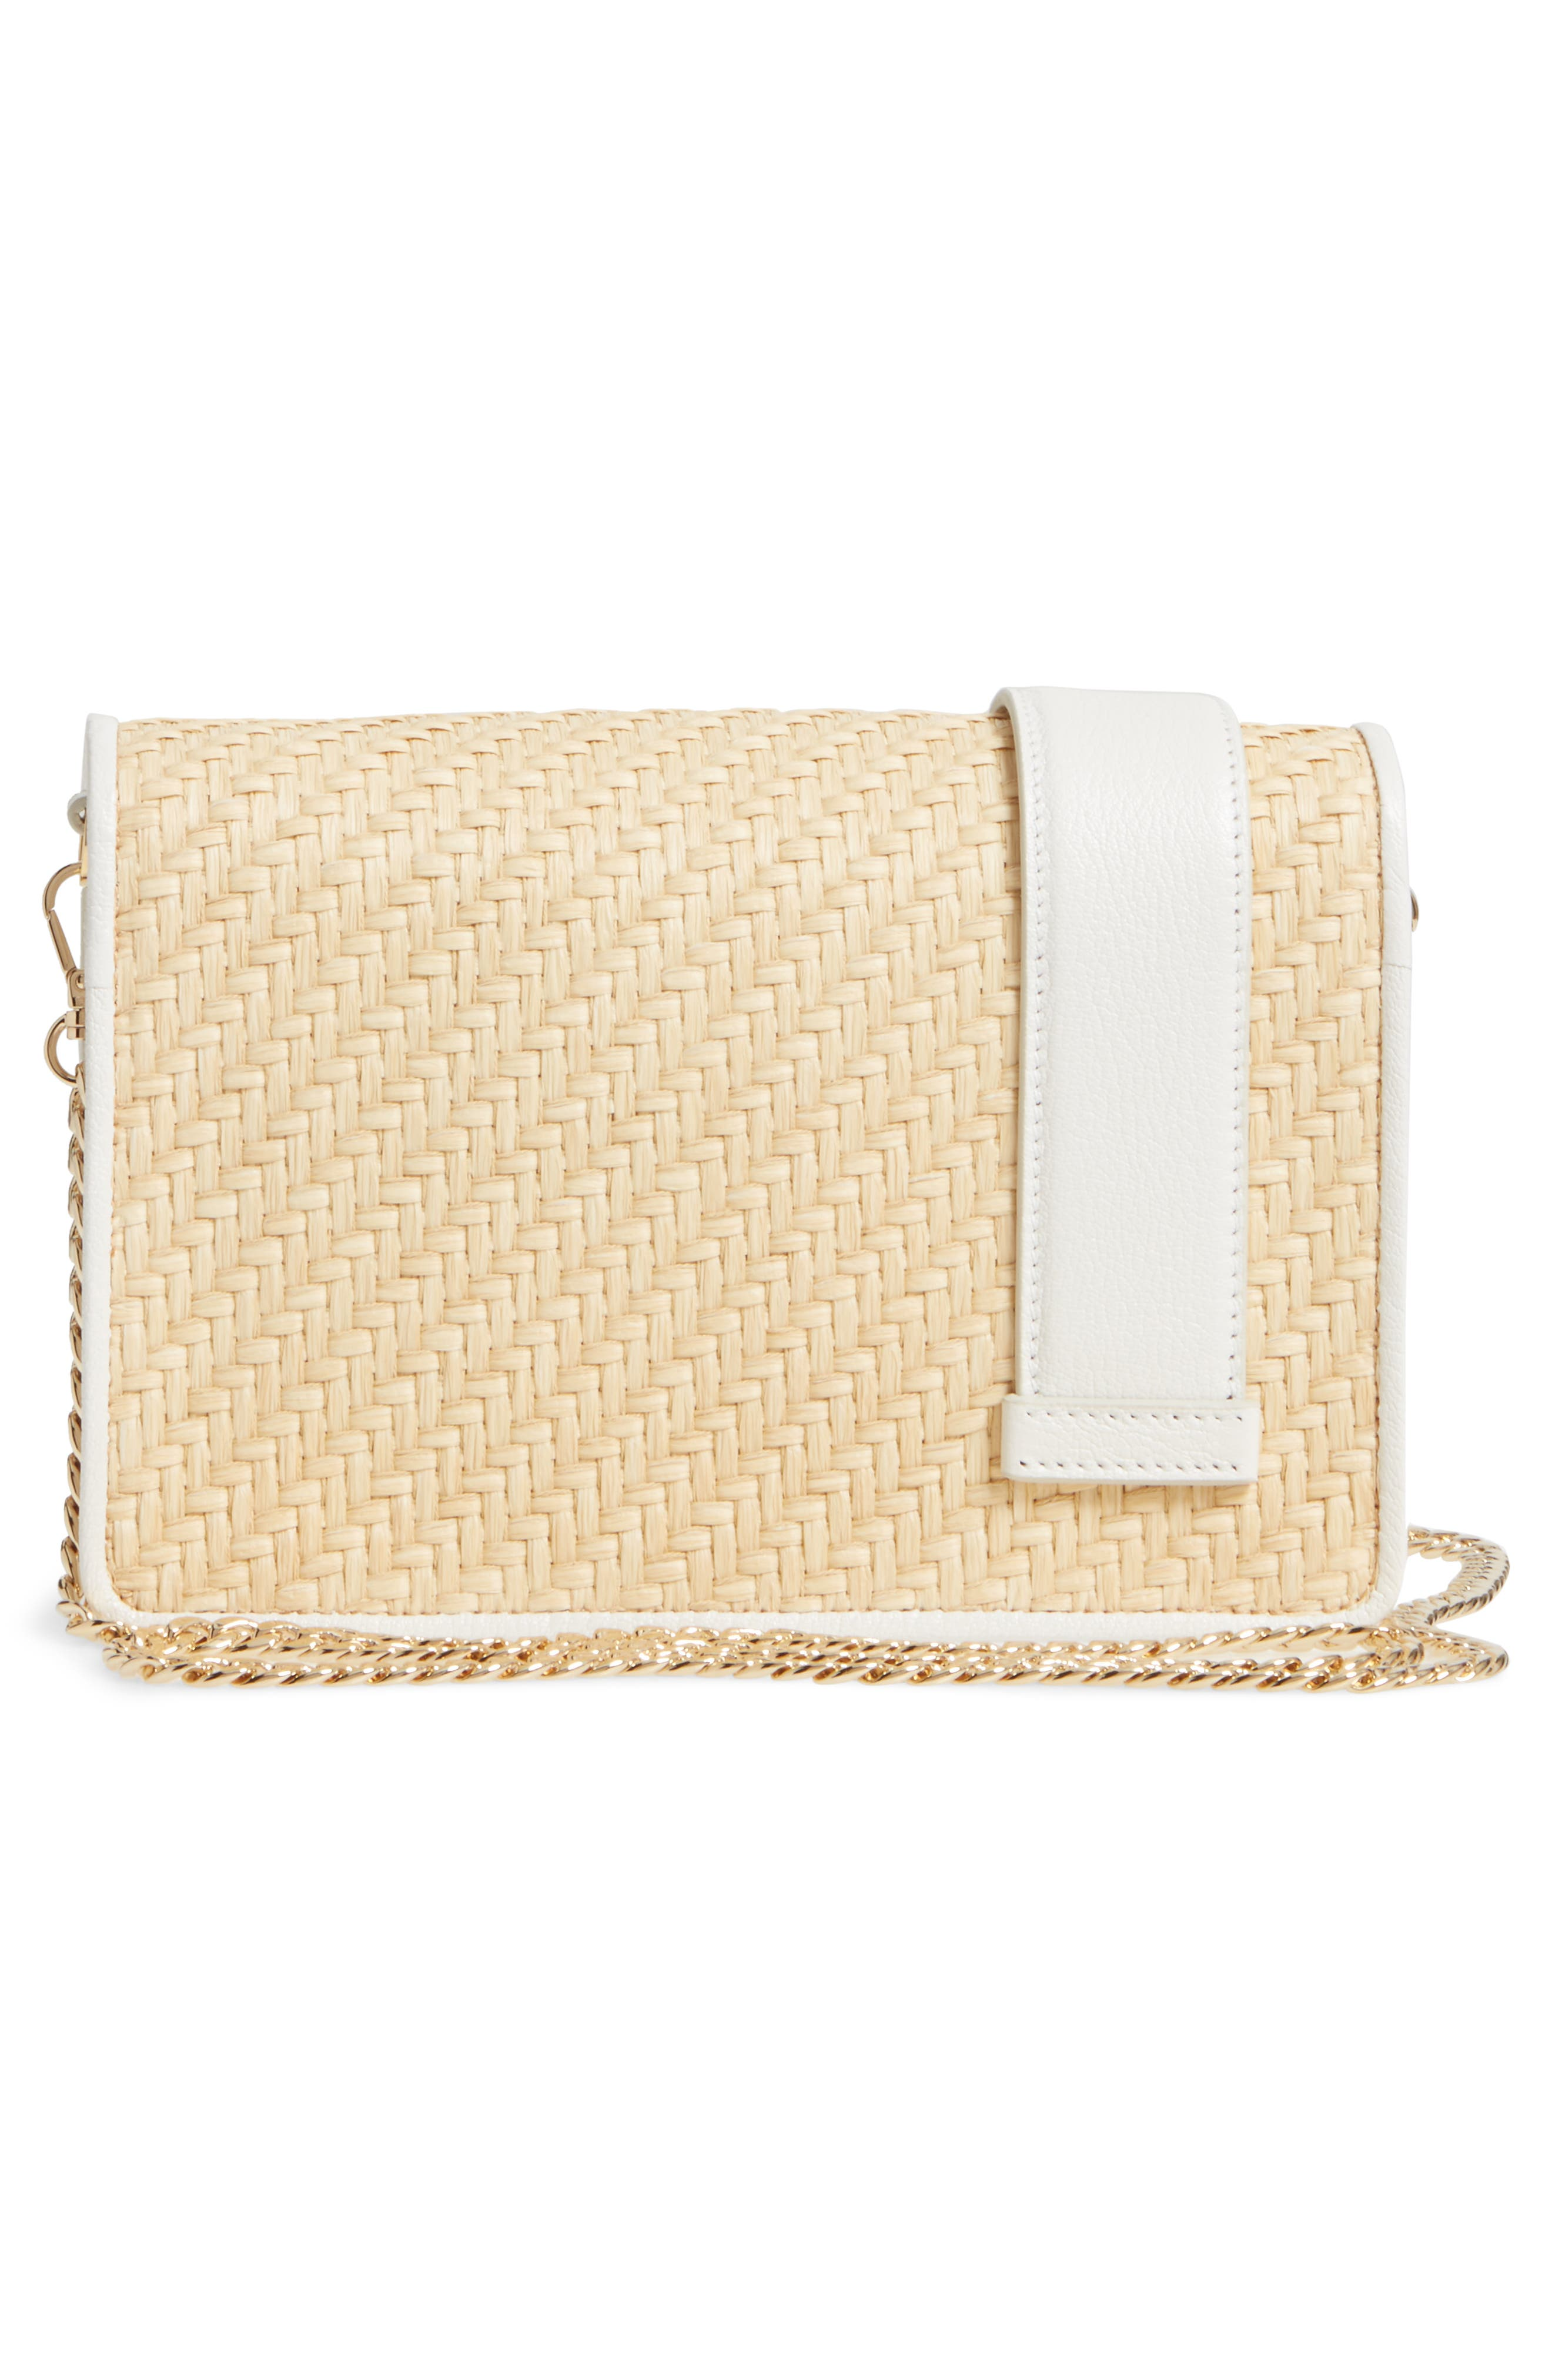 Woven Raffia & Leather Shoulder Bag,                             Alternate thumbnail 3, color,                             NATURALE/ BIANCO